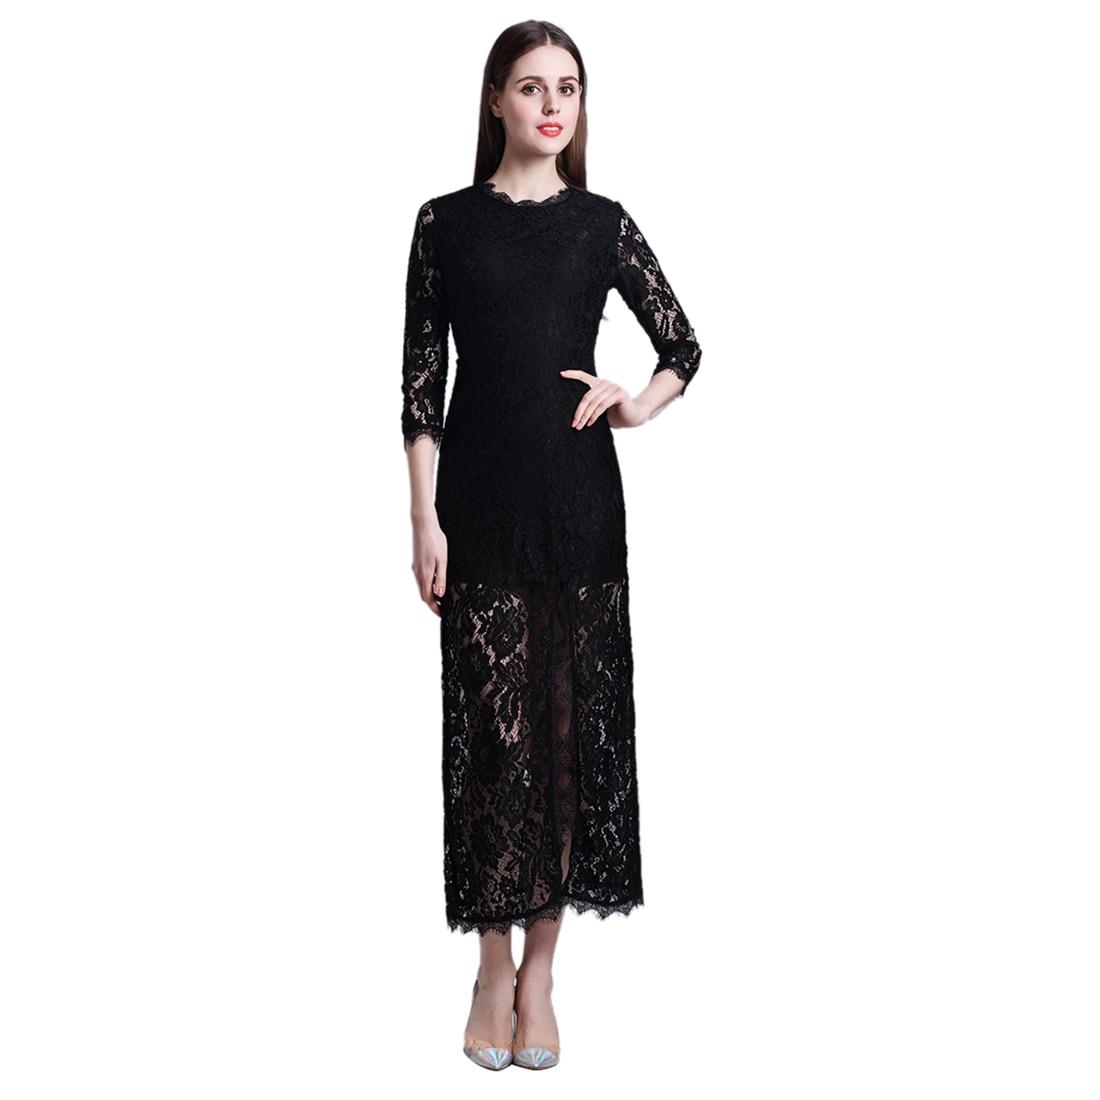 TFGS Original Design Women Hollow Out Lace Long 3 4 Sleeve Split Dress Women Amazing Party